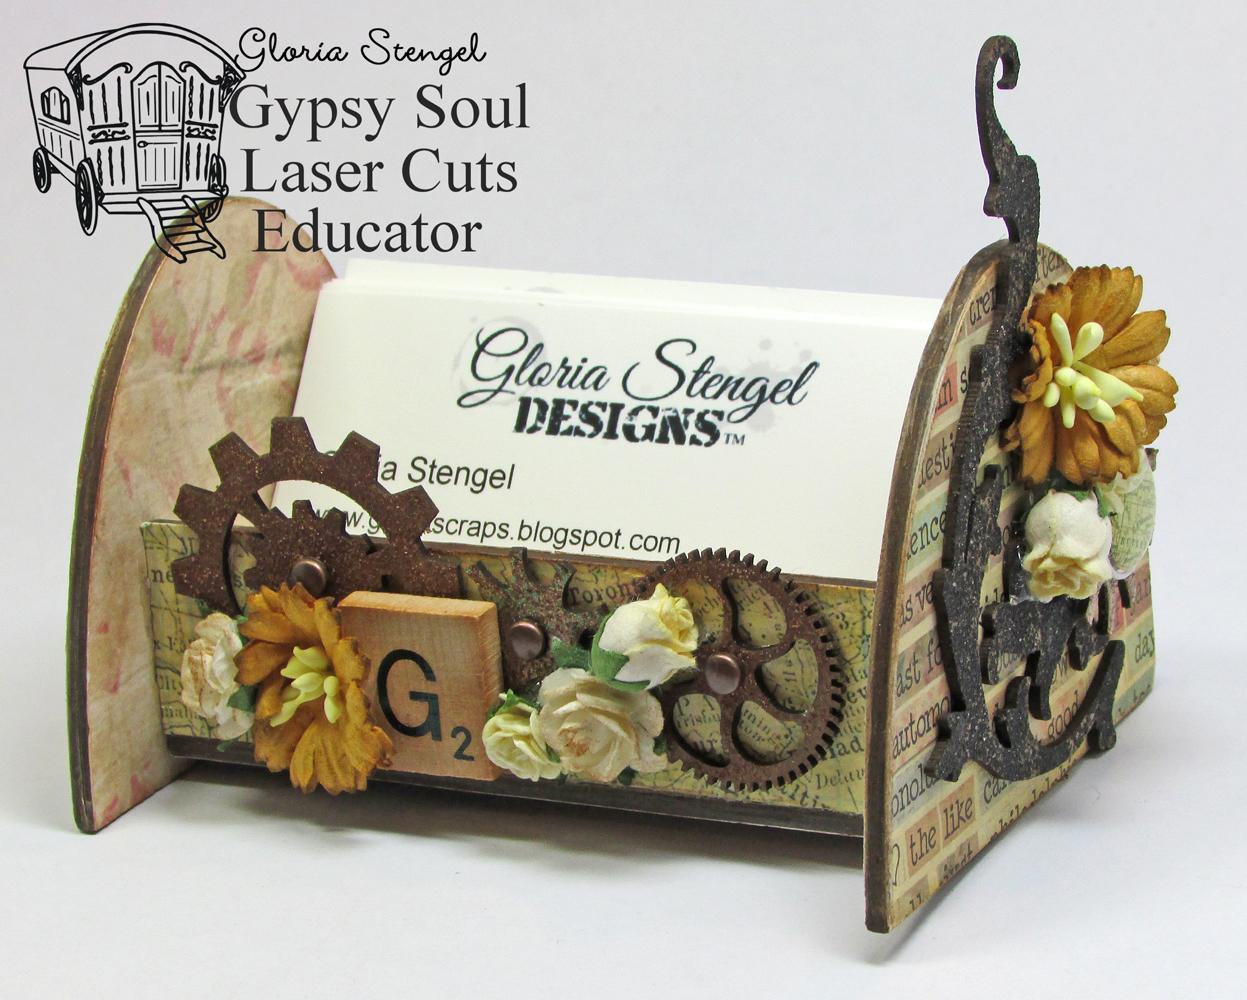 Gypsy Soul Laser Cuts Business Card Holder By Gloria Stengel